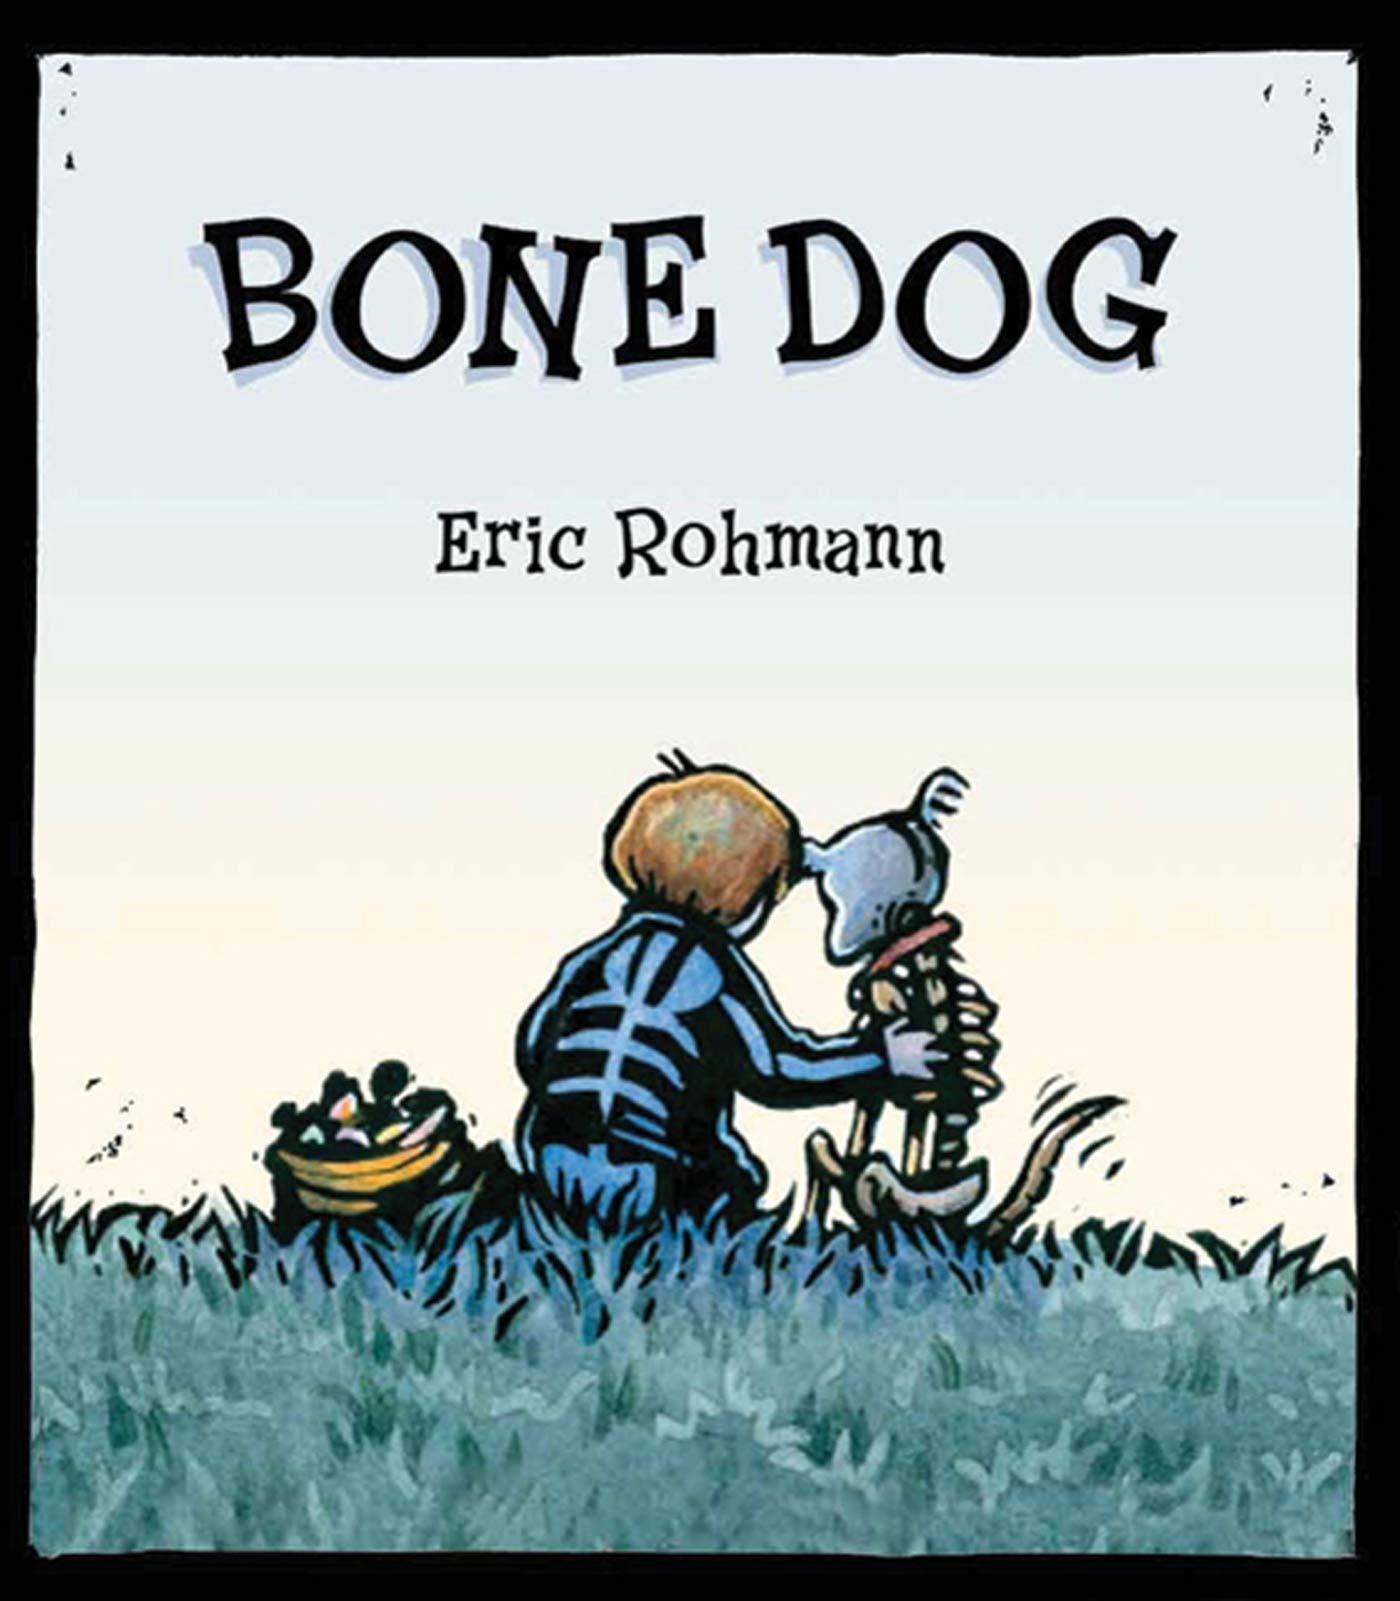 Bone Dog Halloween book